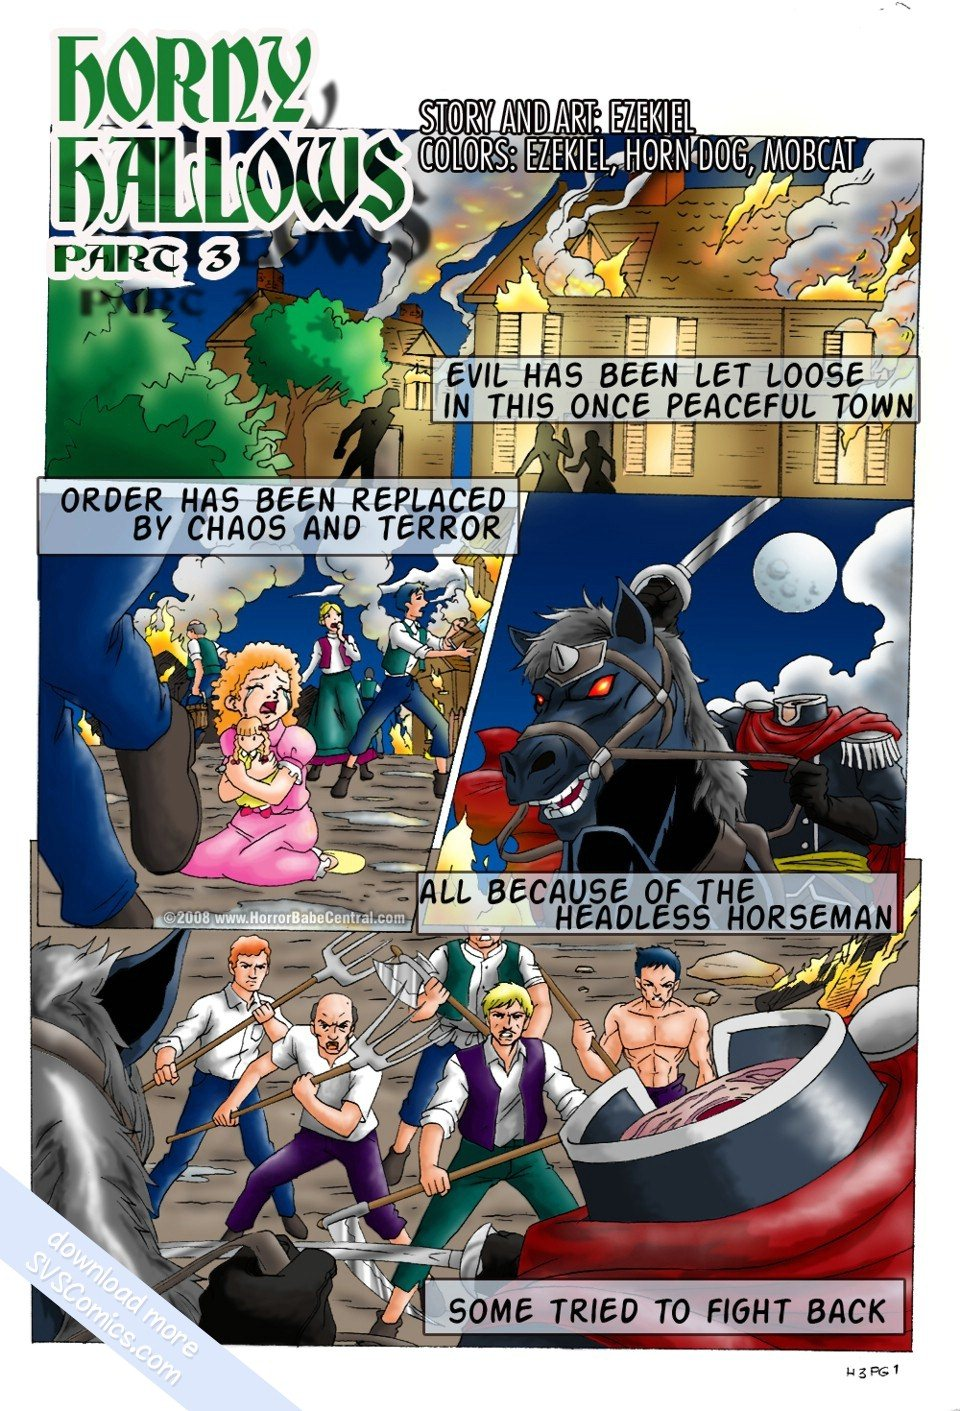 Porn Comics - Horny Hollows 3 Headless Phantom porn comics 8 muses